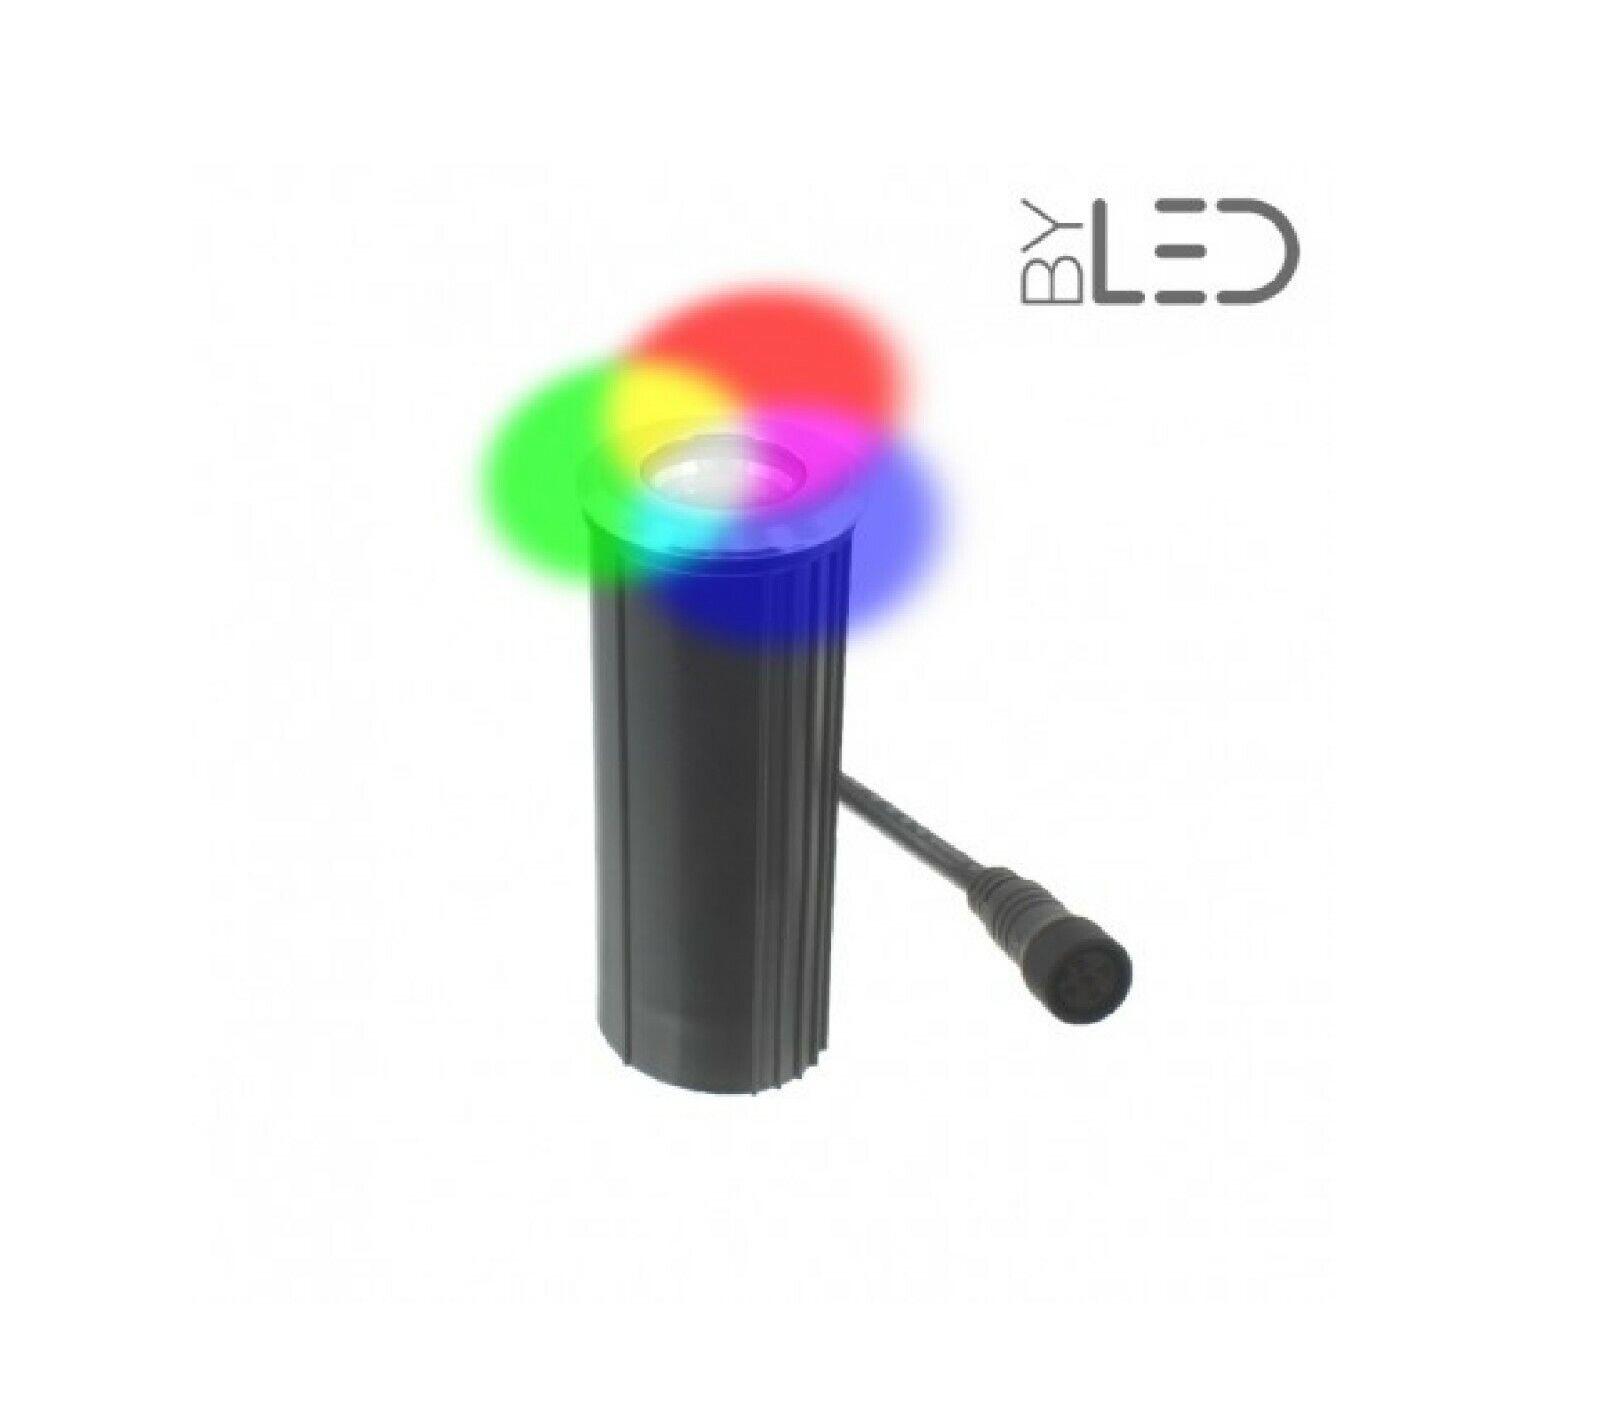 BYLED DK-04-24V-B-RGB-W - Spot LED encastré de sol 4W RGB + blancoh chaud NEUF